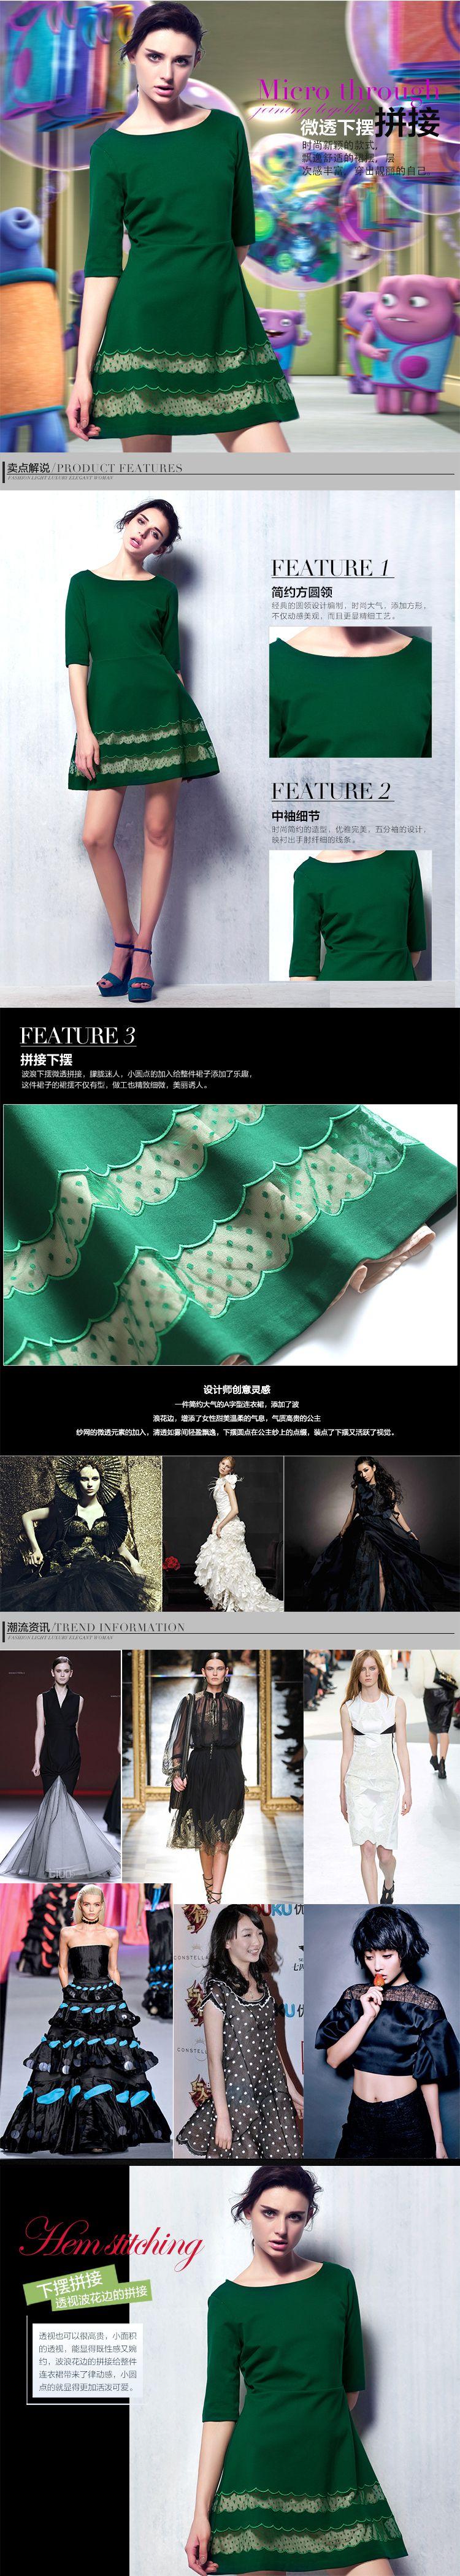 lux绿色底边拼接波浪花边长袖罗马连衣裙03787gn01